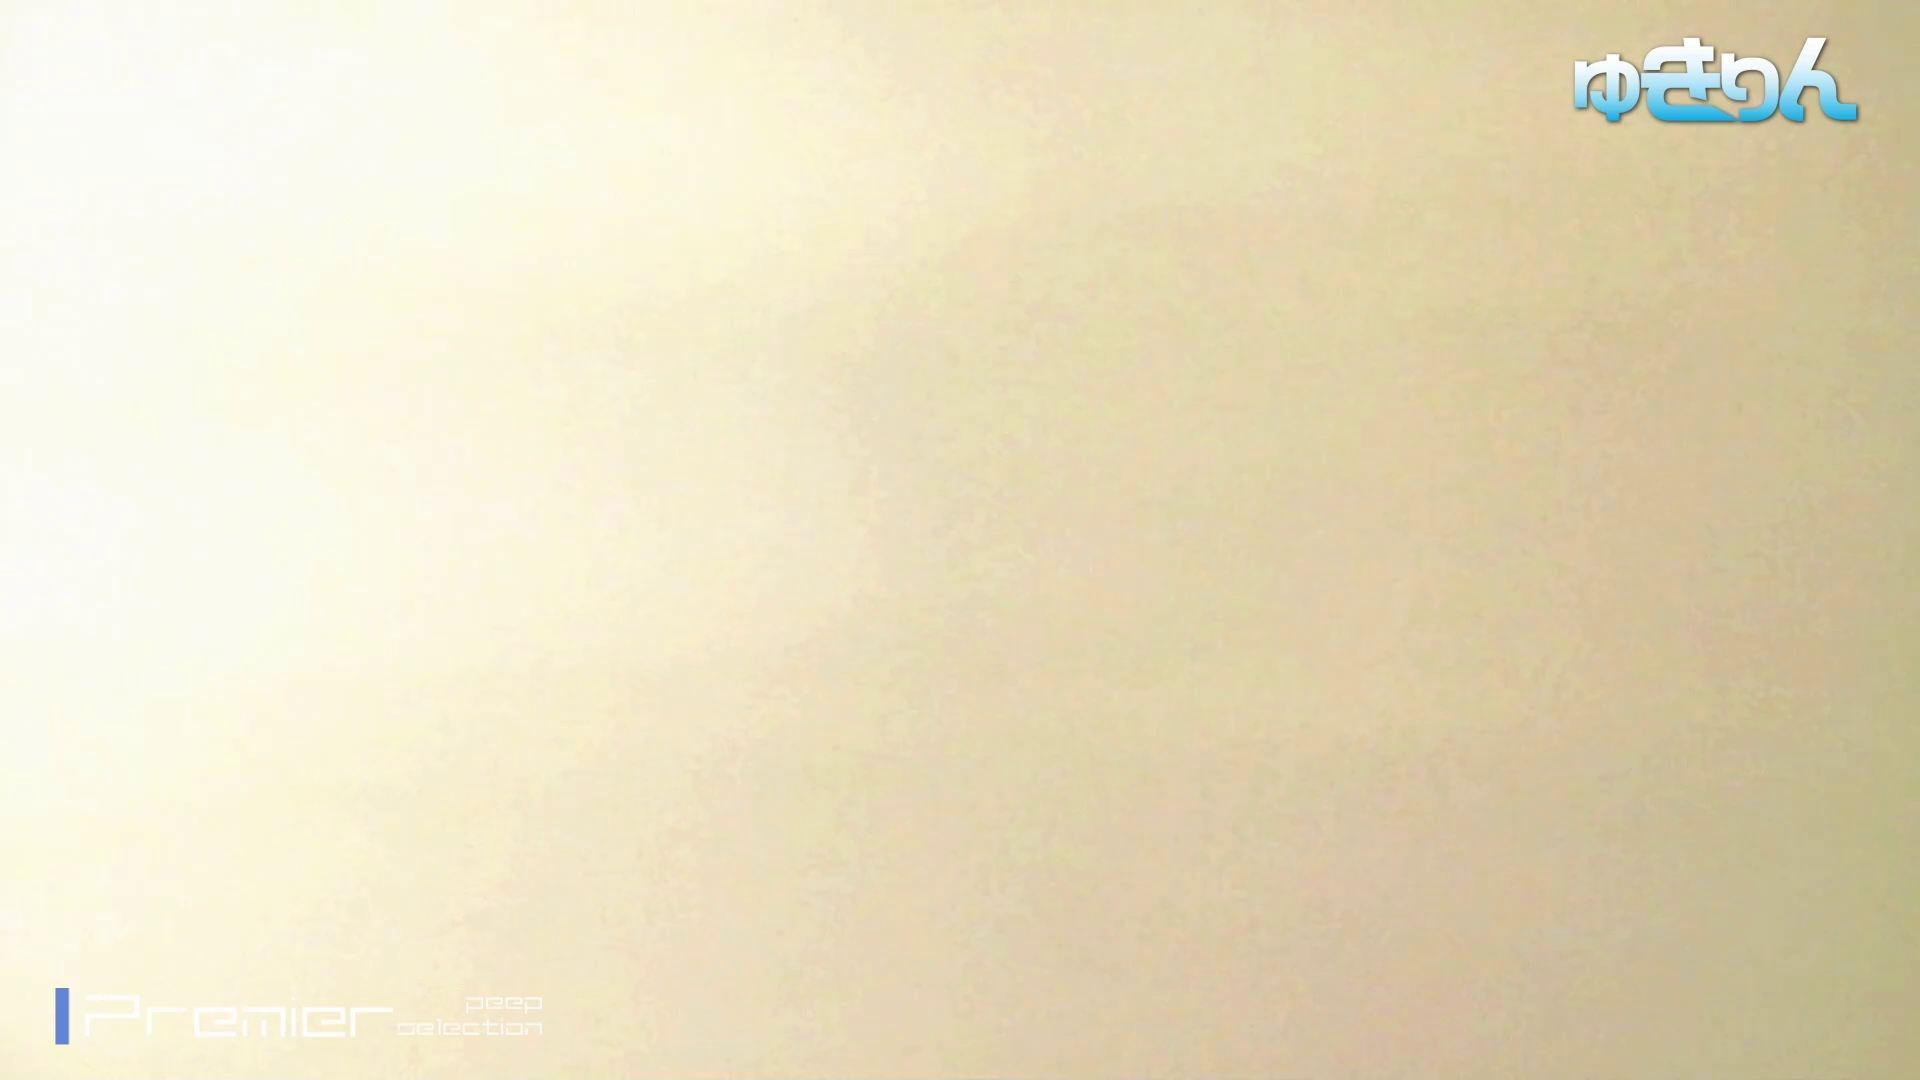 新世界の射窓 No95 細身体型 AV無料 112枚 99